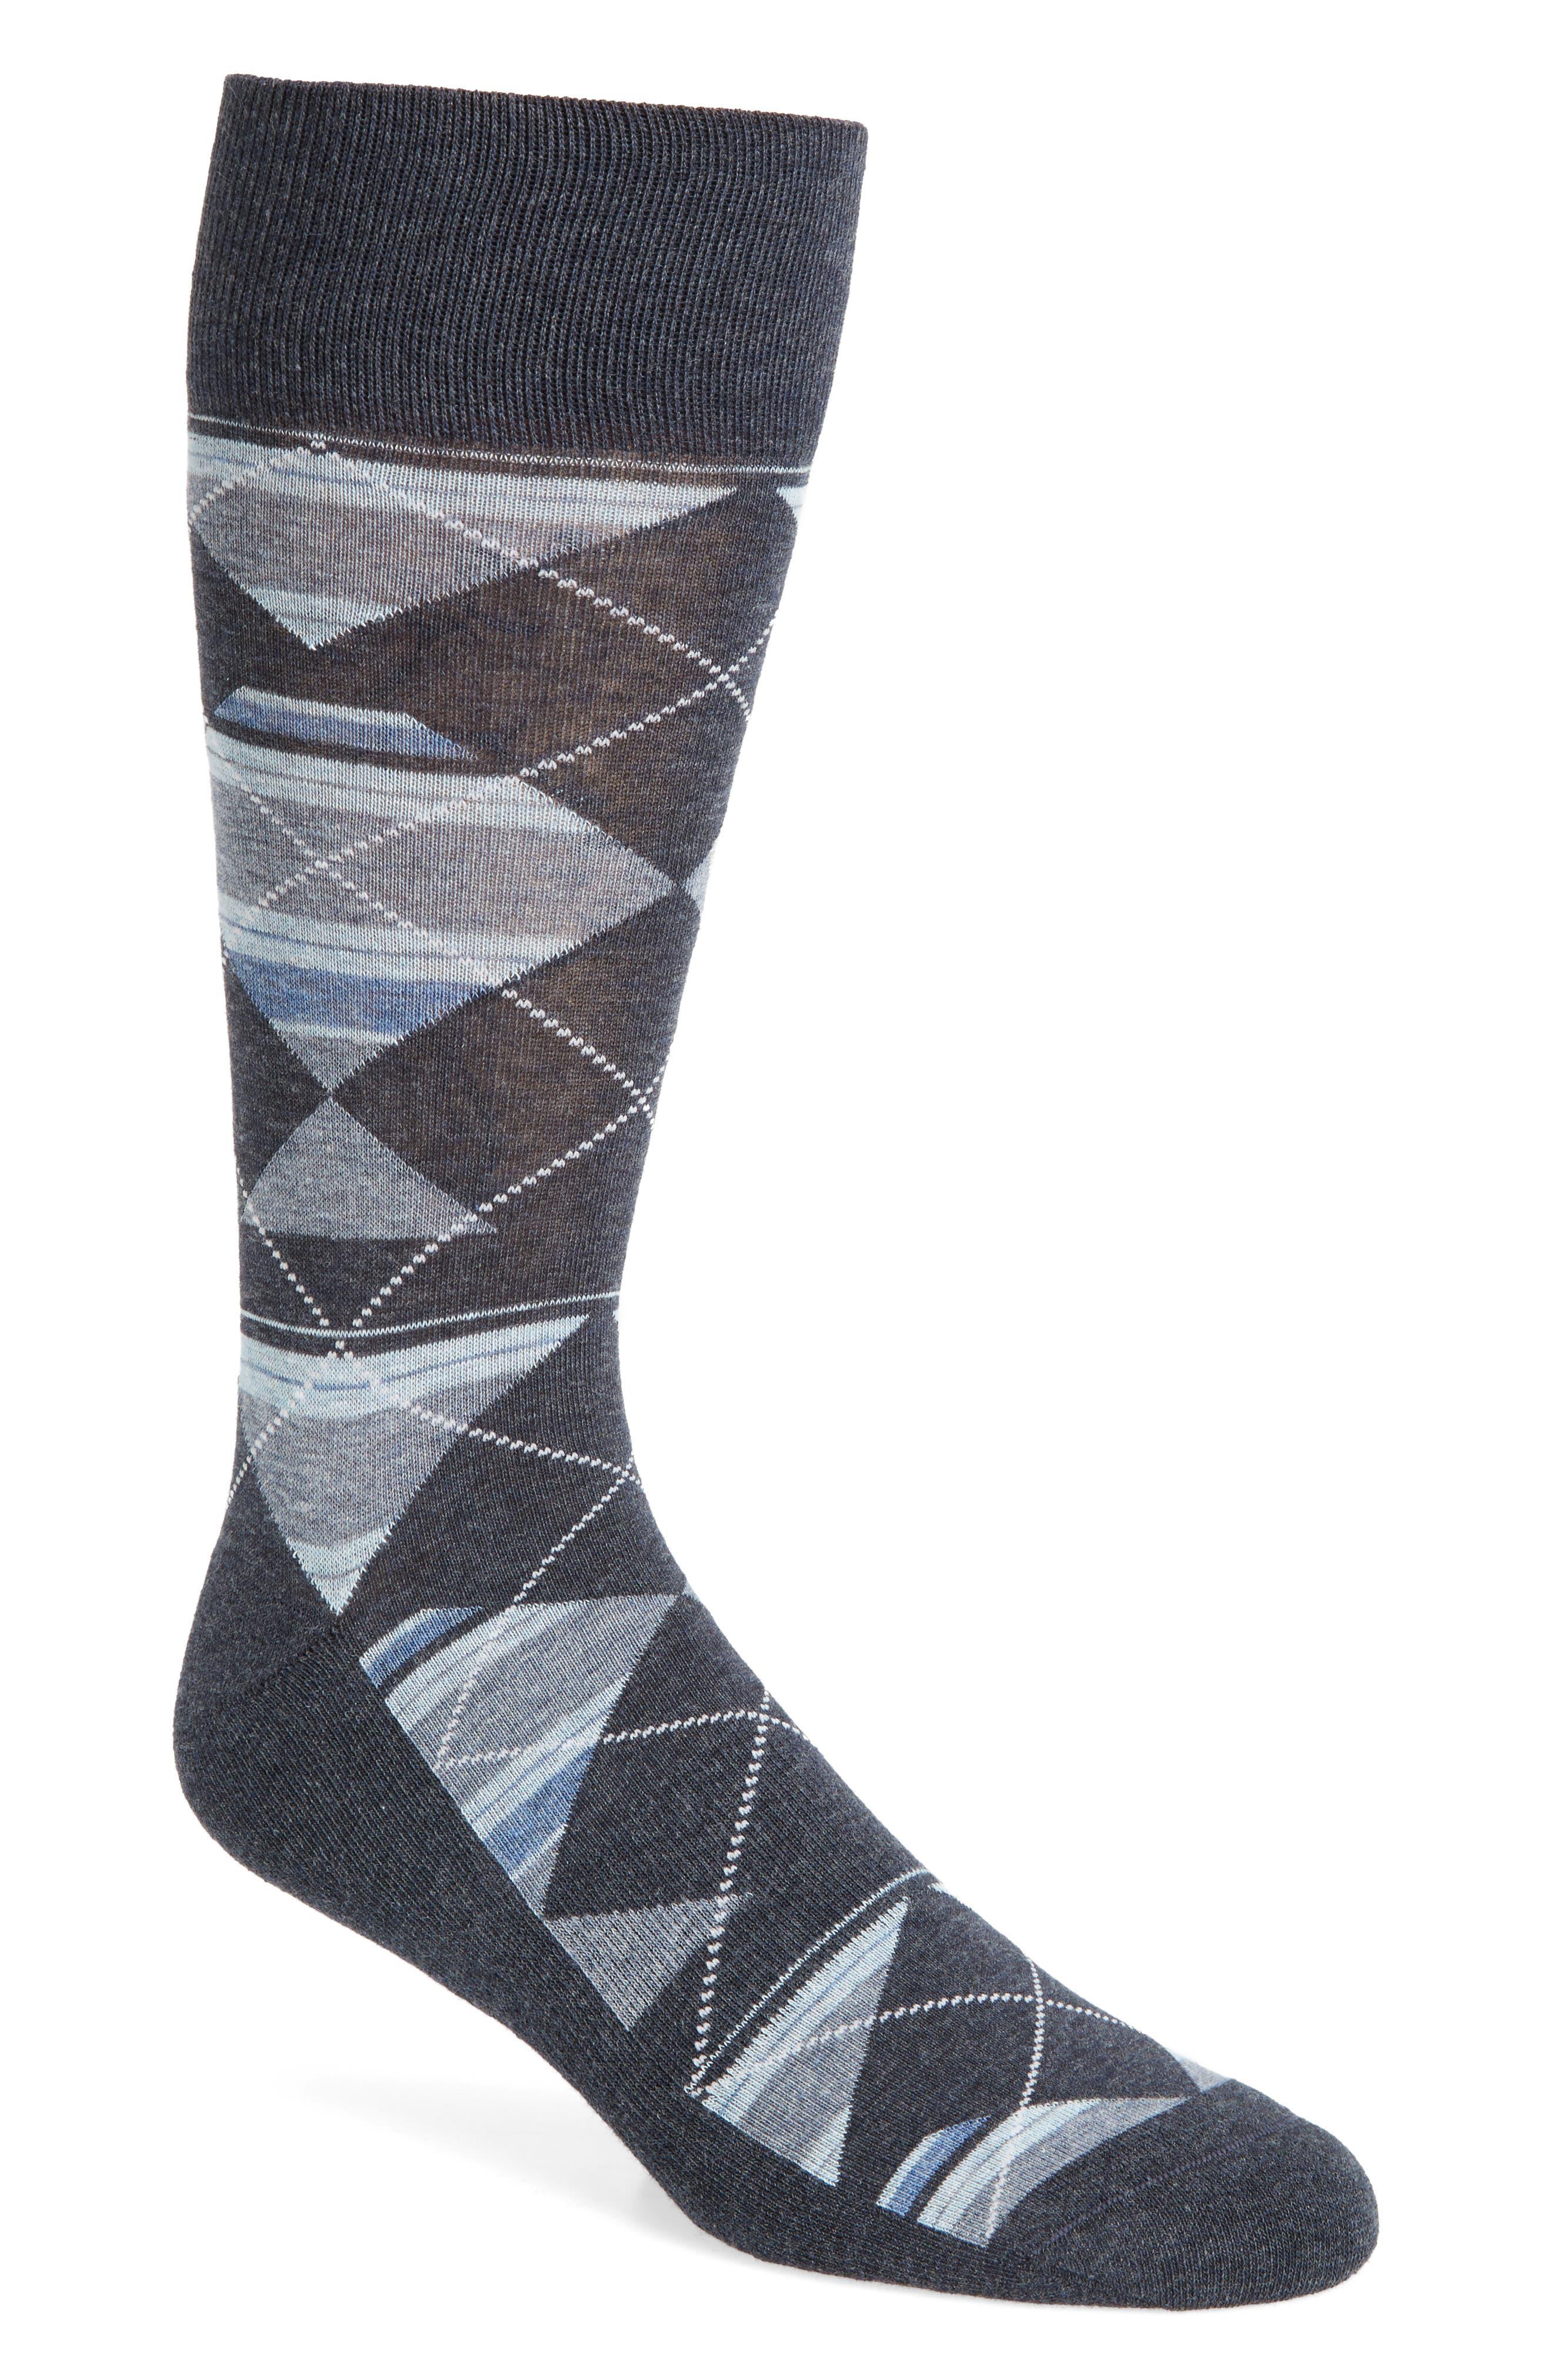 Multistripe Argyle Socks,                         Main,                         color, Navy Heather